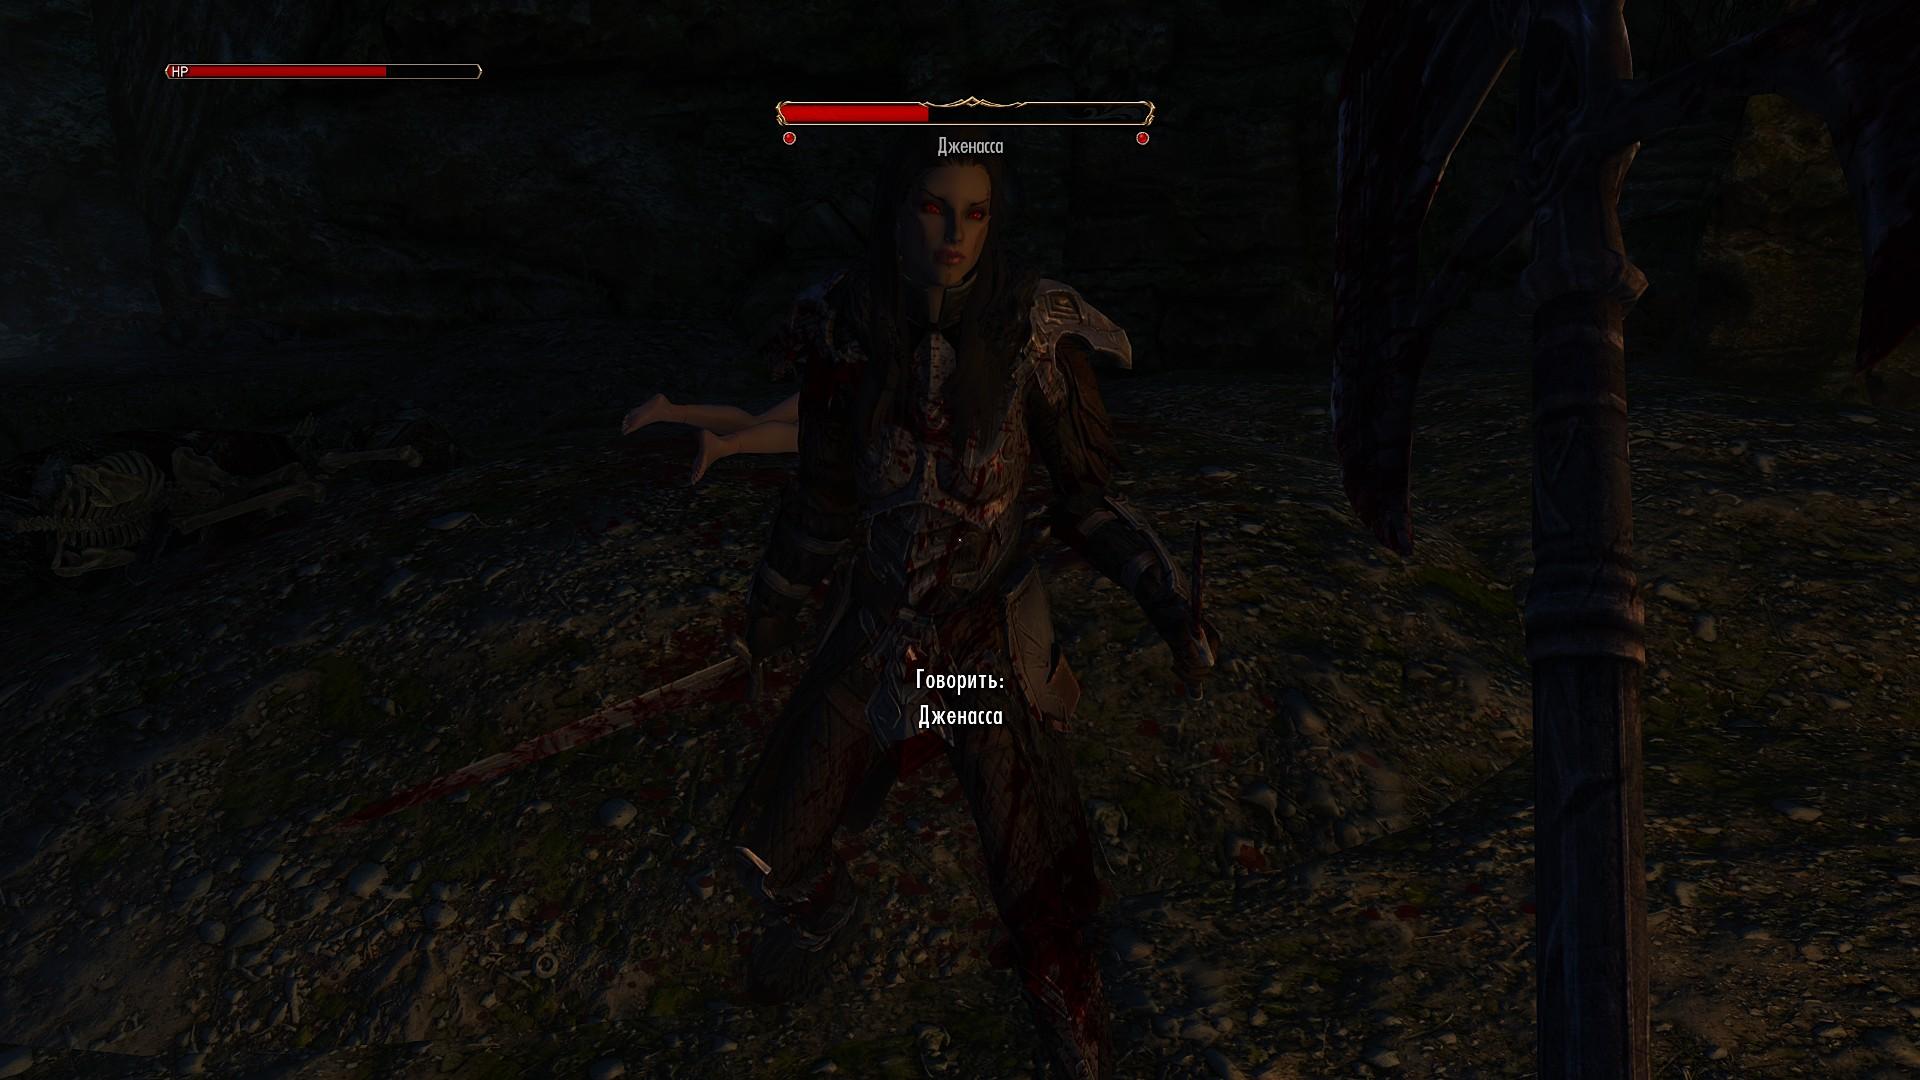 20190621225944_1.jpg - Elder Scrolls 5: Skyrim, the